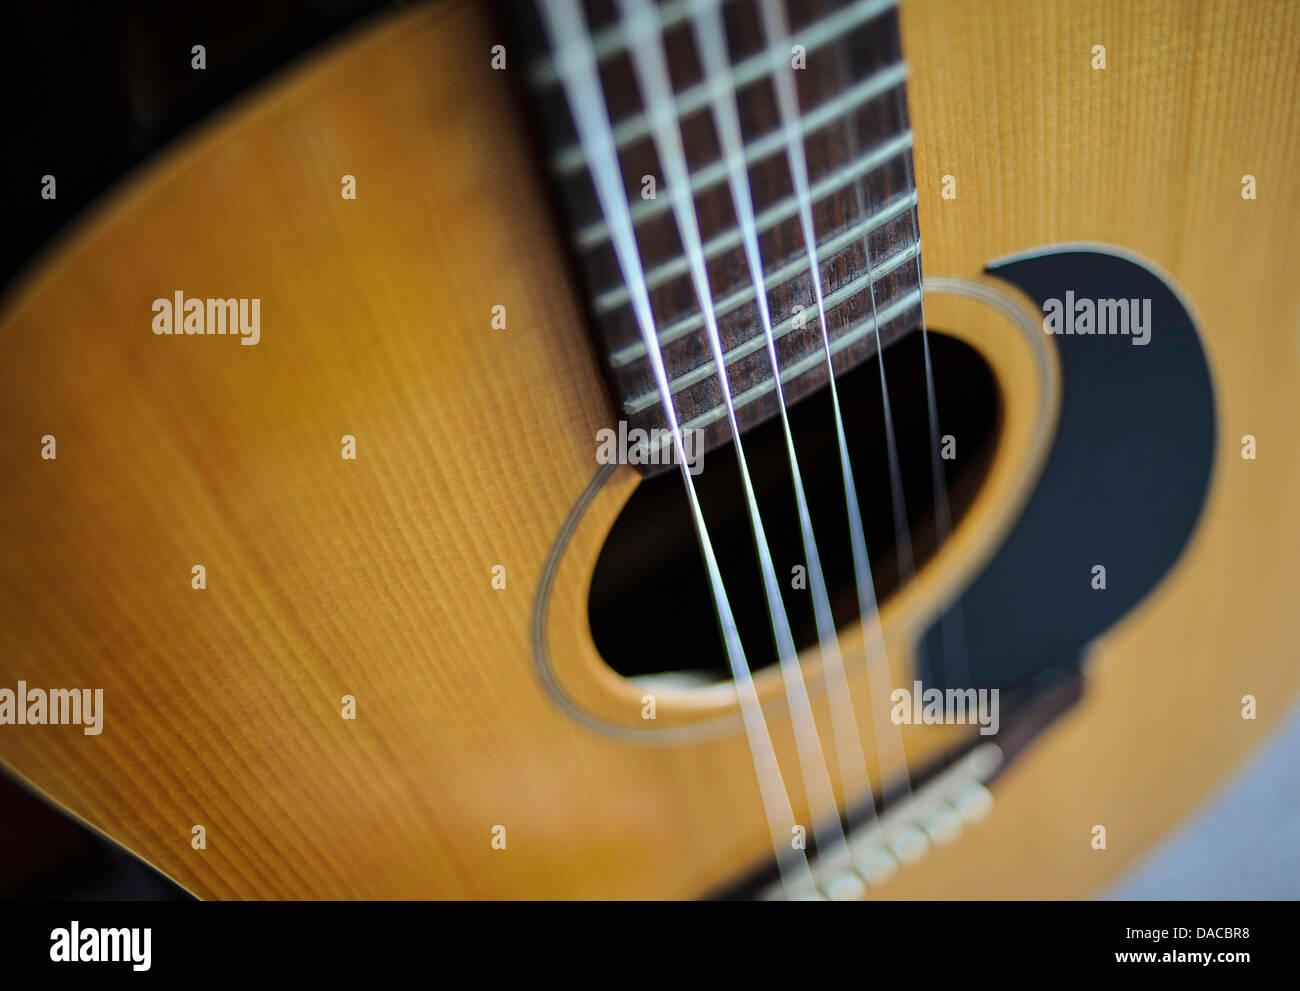 vibrating guitar string stock photos vibrating guitar string stock images alamy. Black Bedroom Furniture Sets. Home Design Ideas